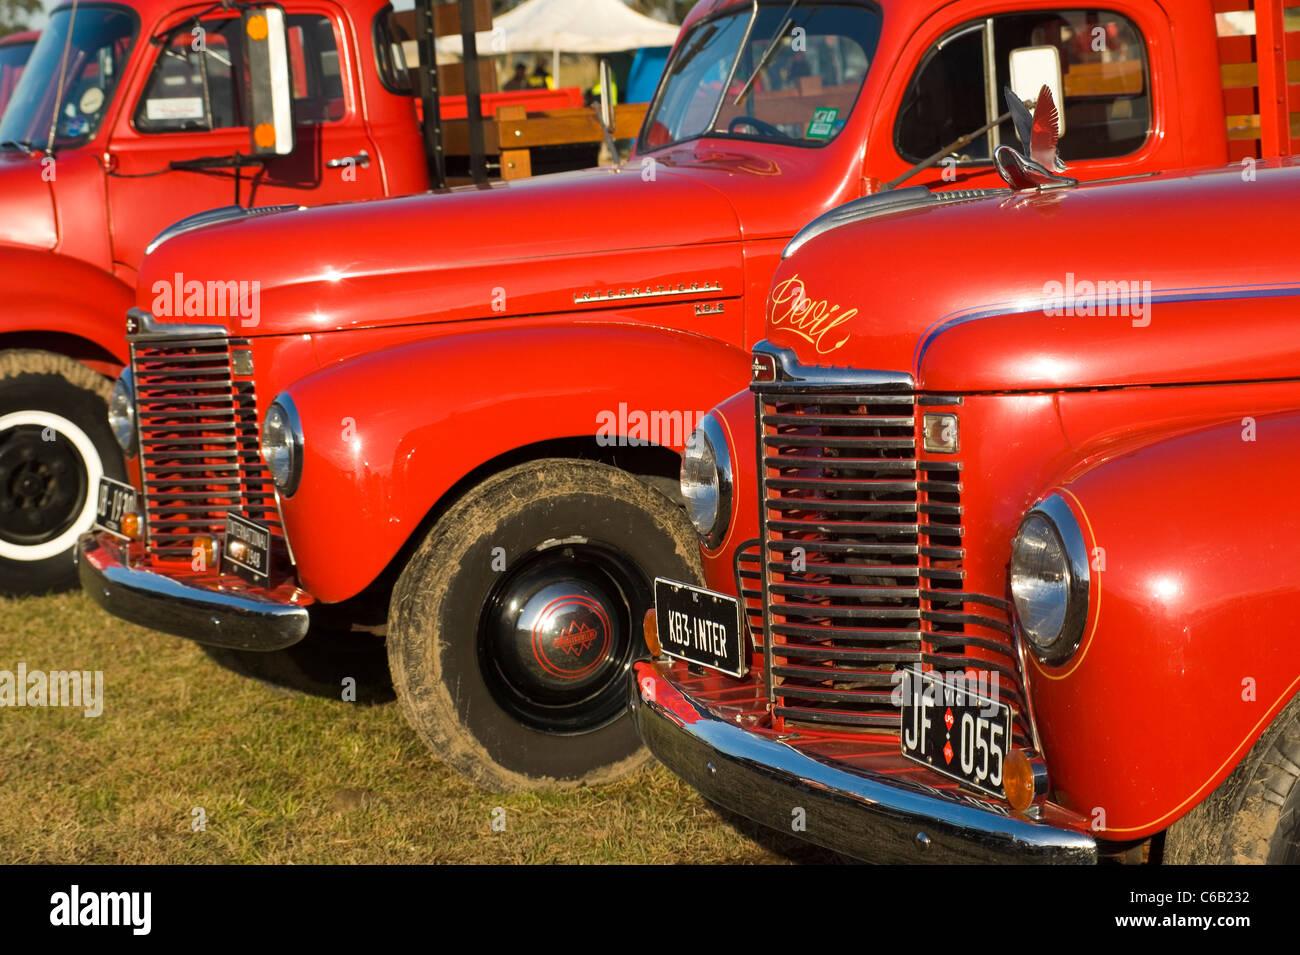 old restored red trucks Stock Photo: 38351798 - Alamy